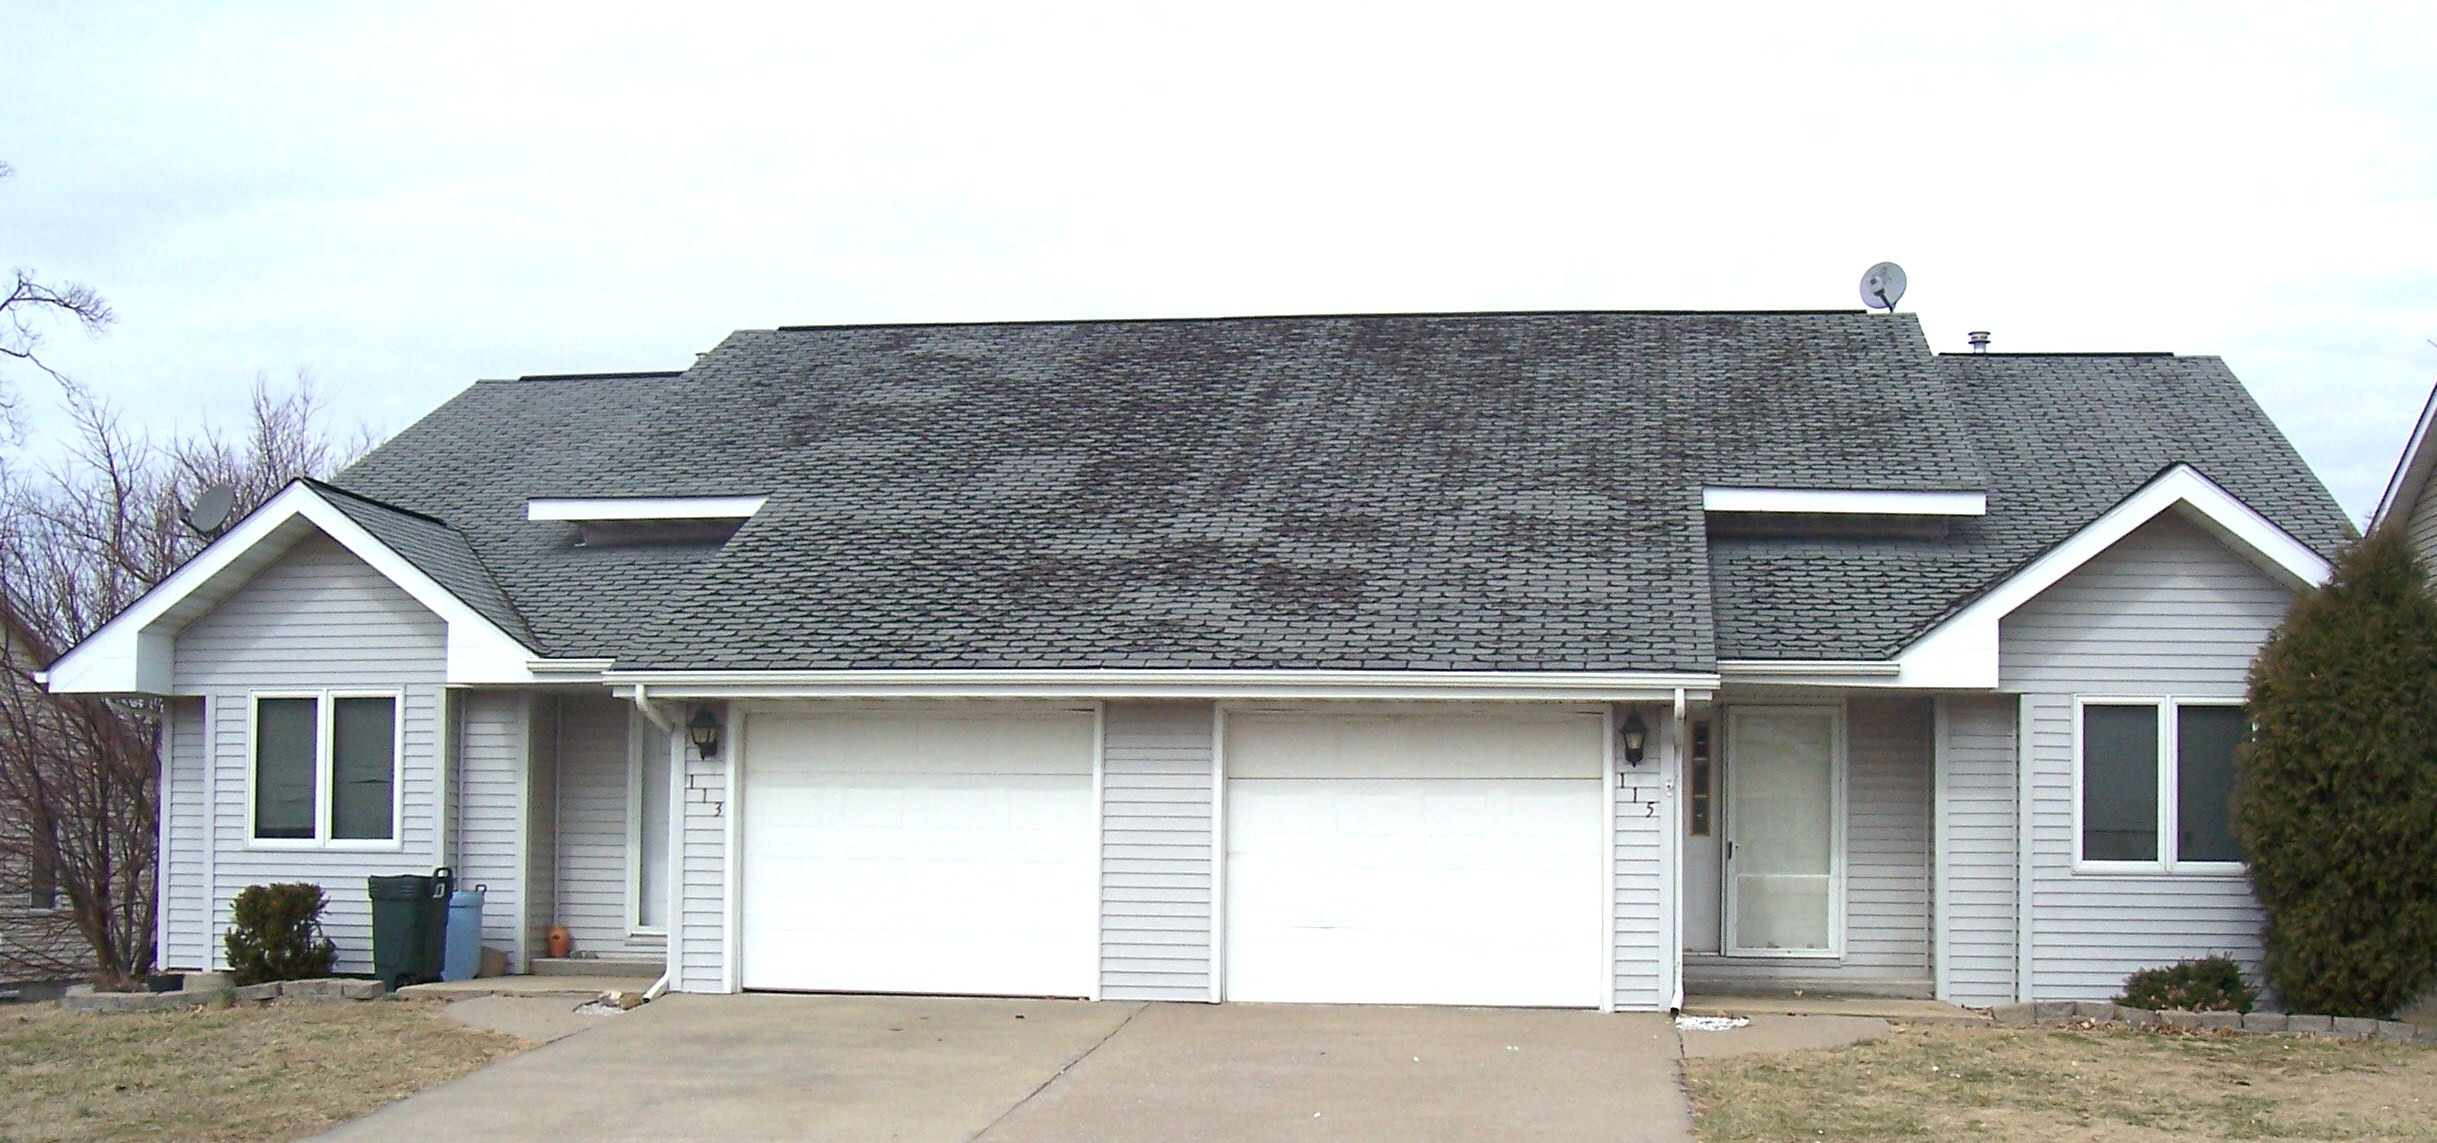 113-115 E. Hunters Rdge, Valmeyer, Illinois 62295